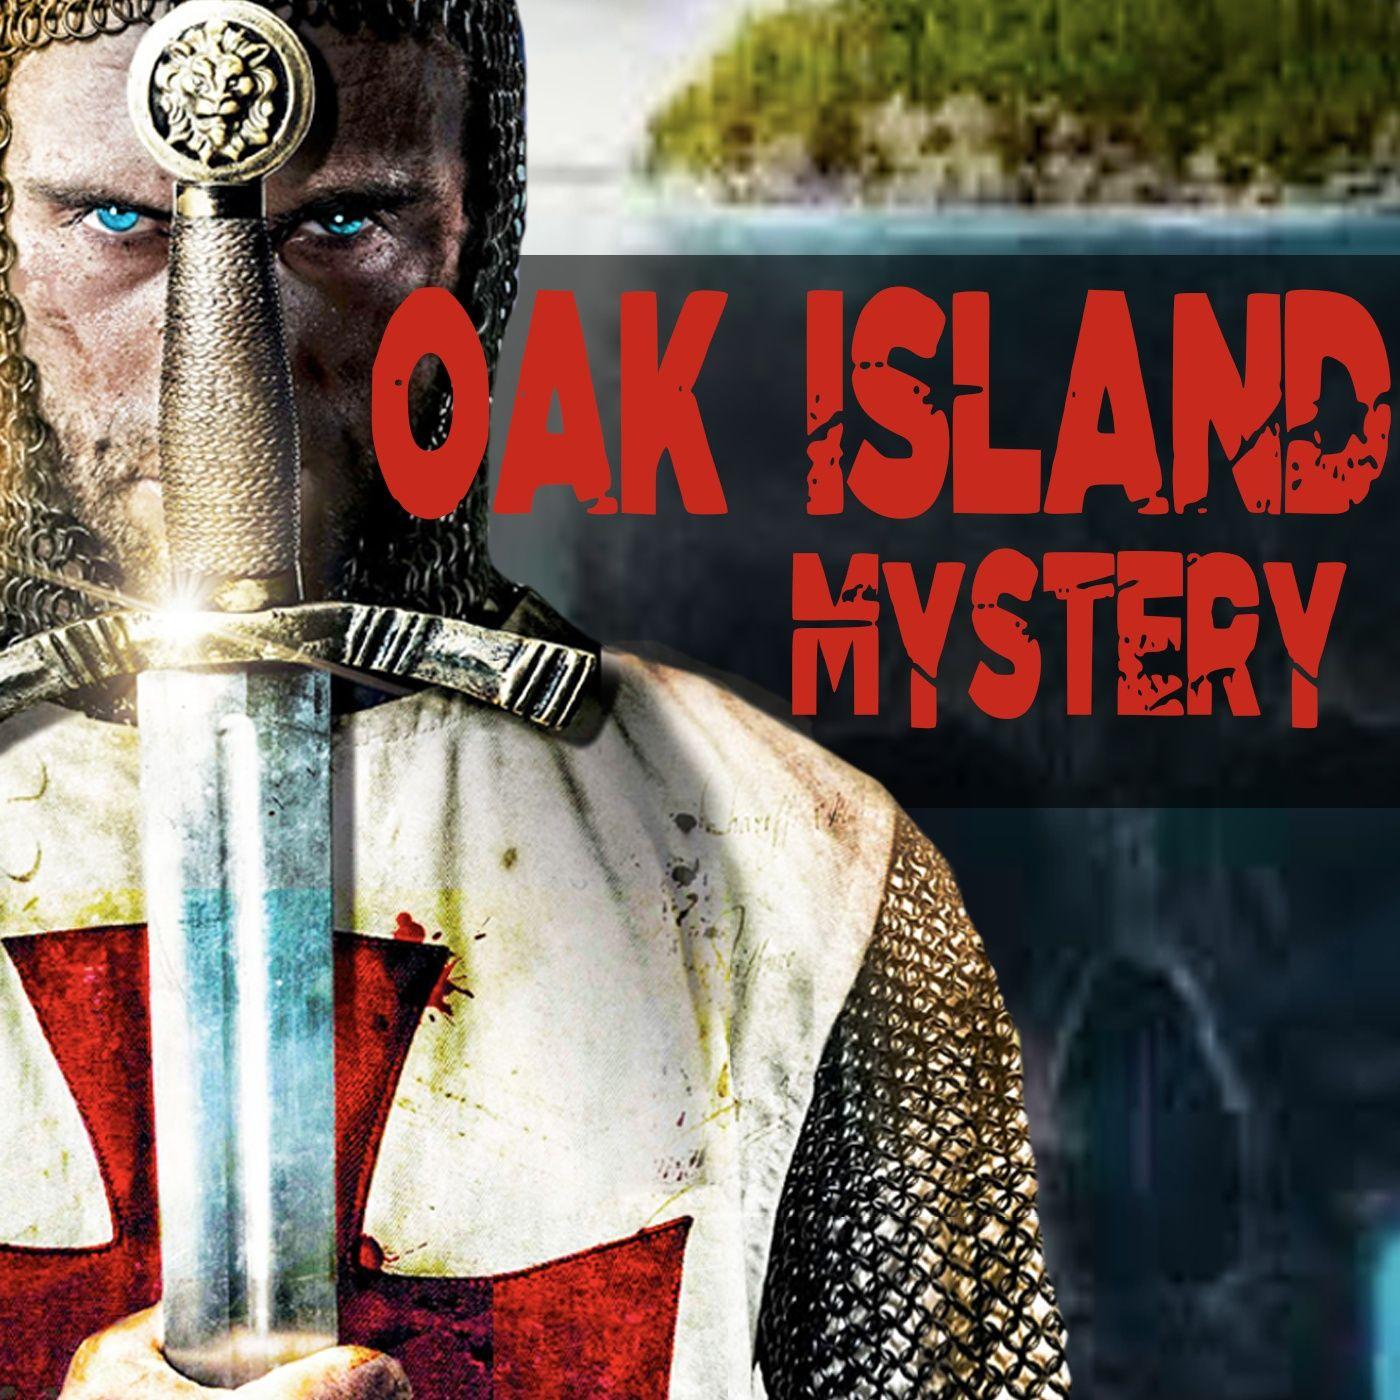 OAK ISLAND Hidden Mystery and the Knights Templar TREASURES